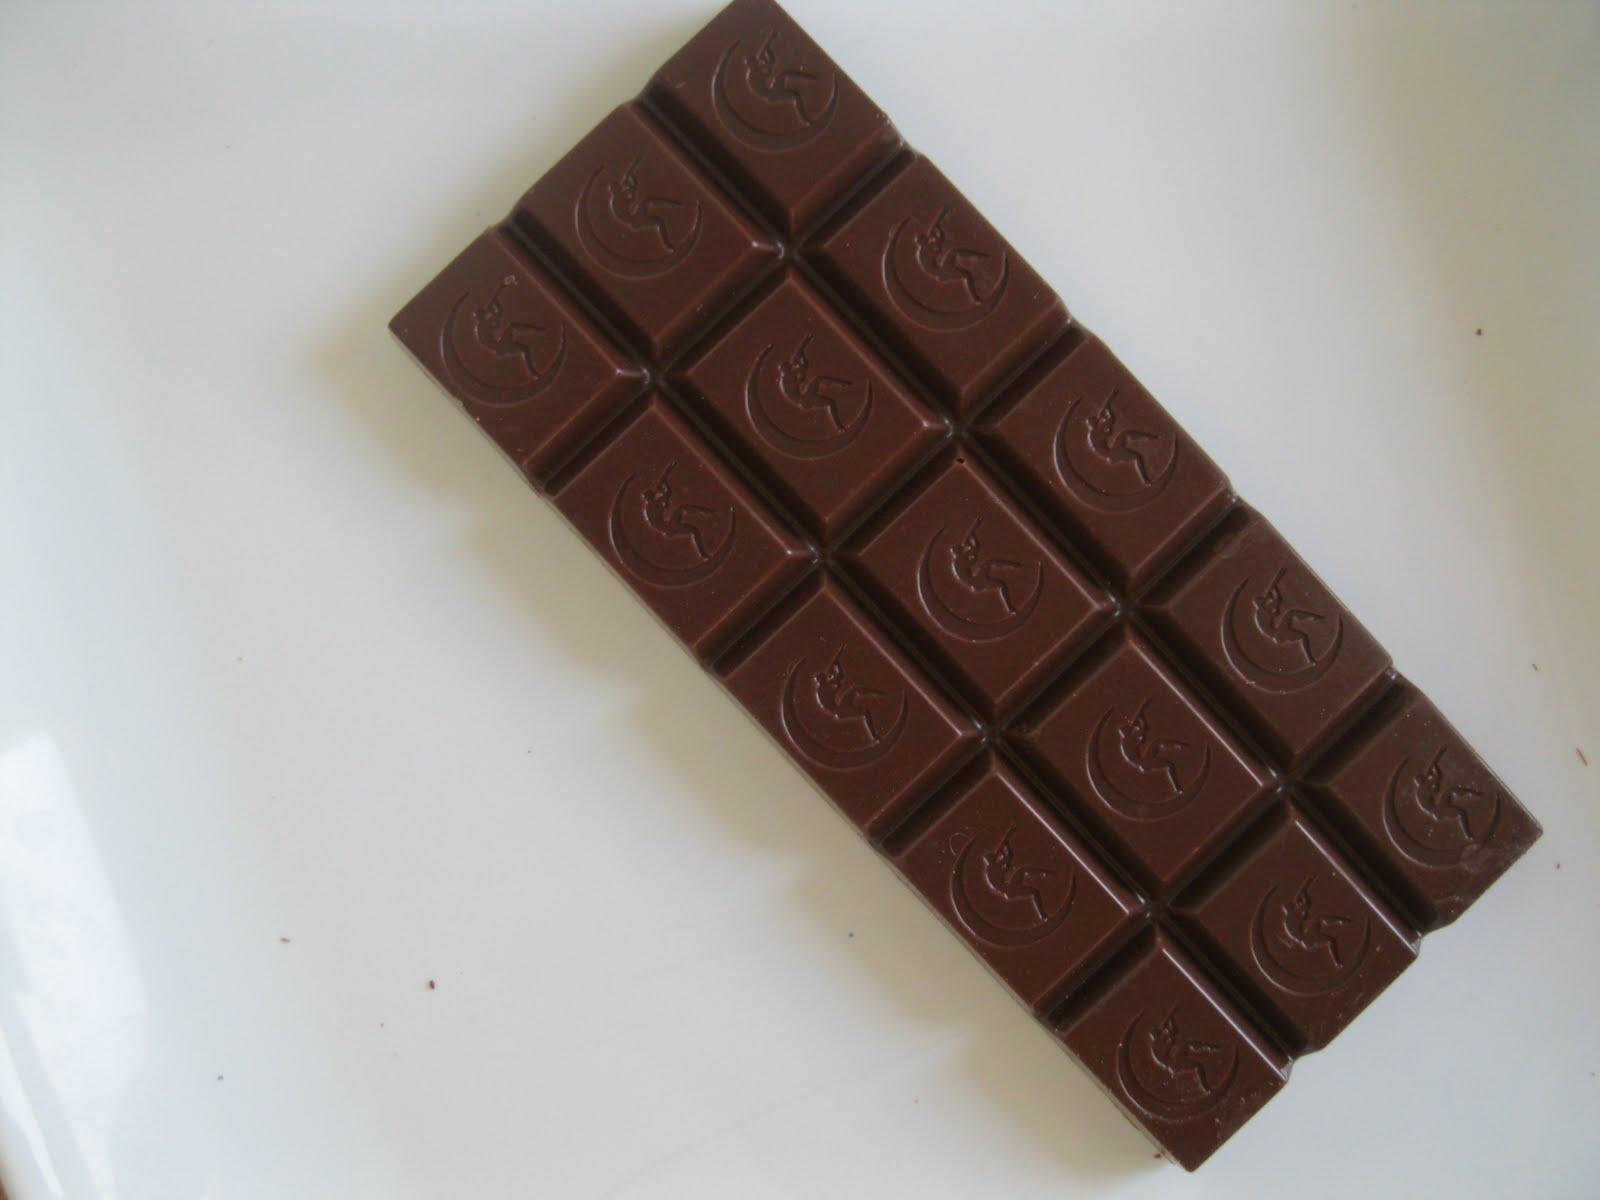 Moonstruck Chocolate Bar Flavors